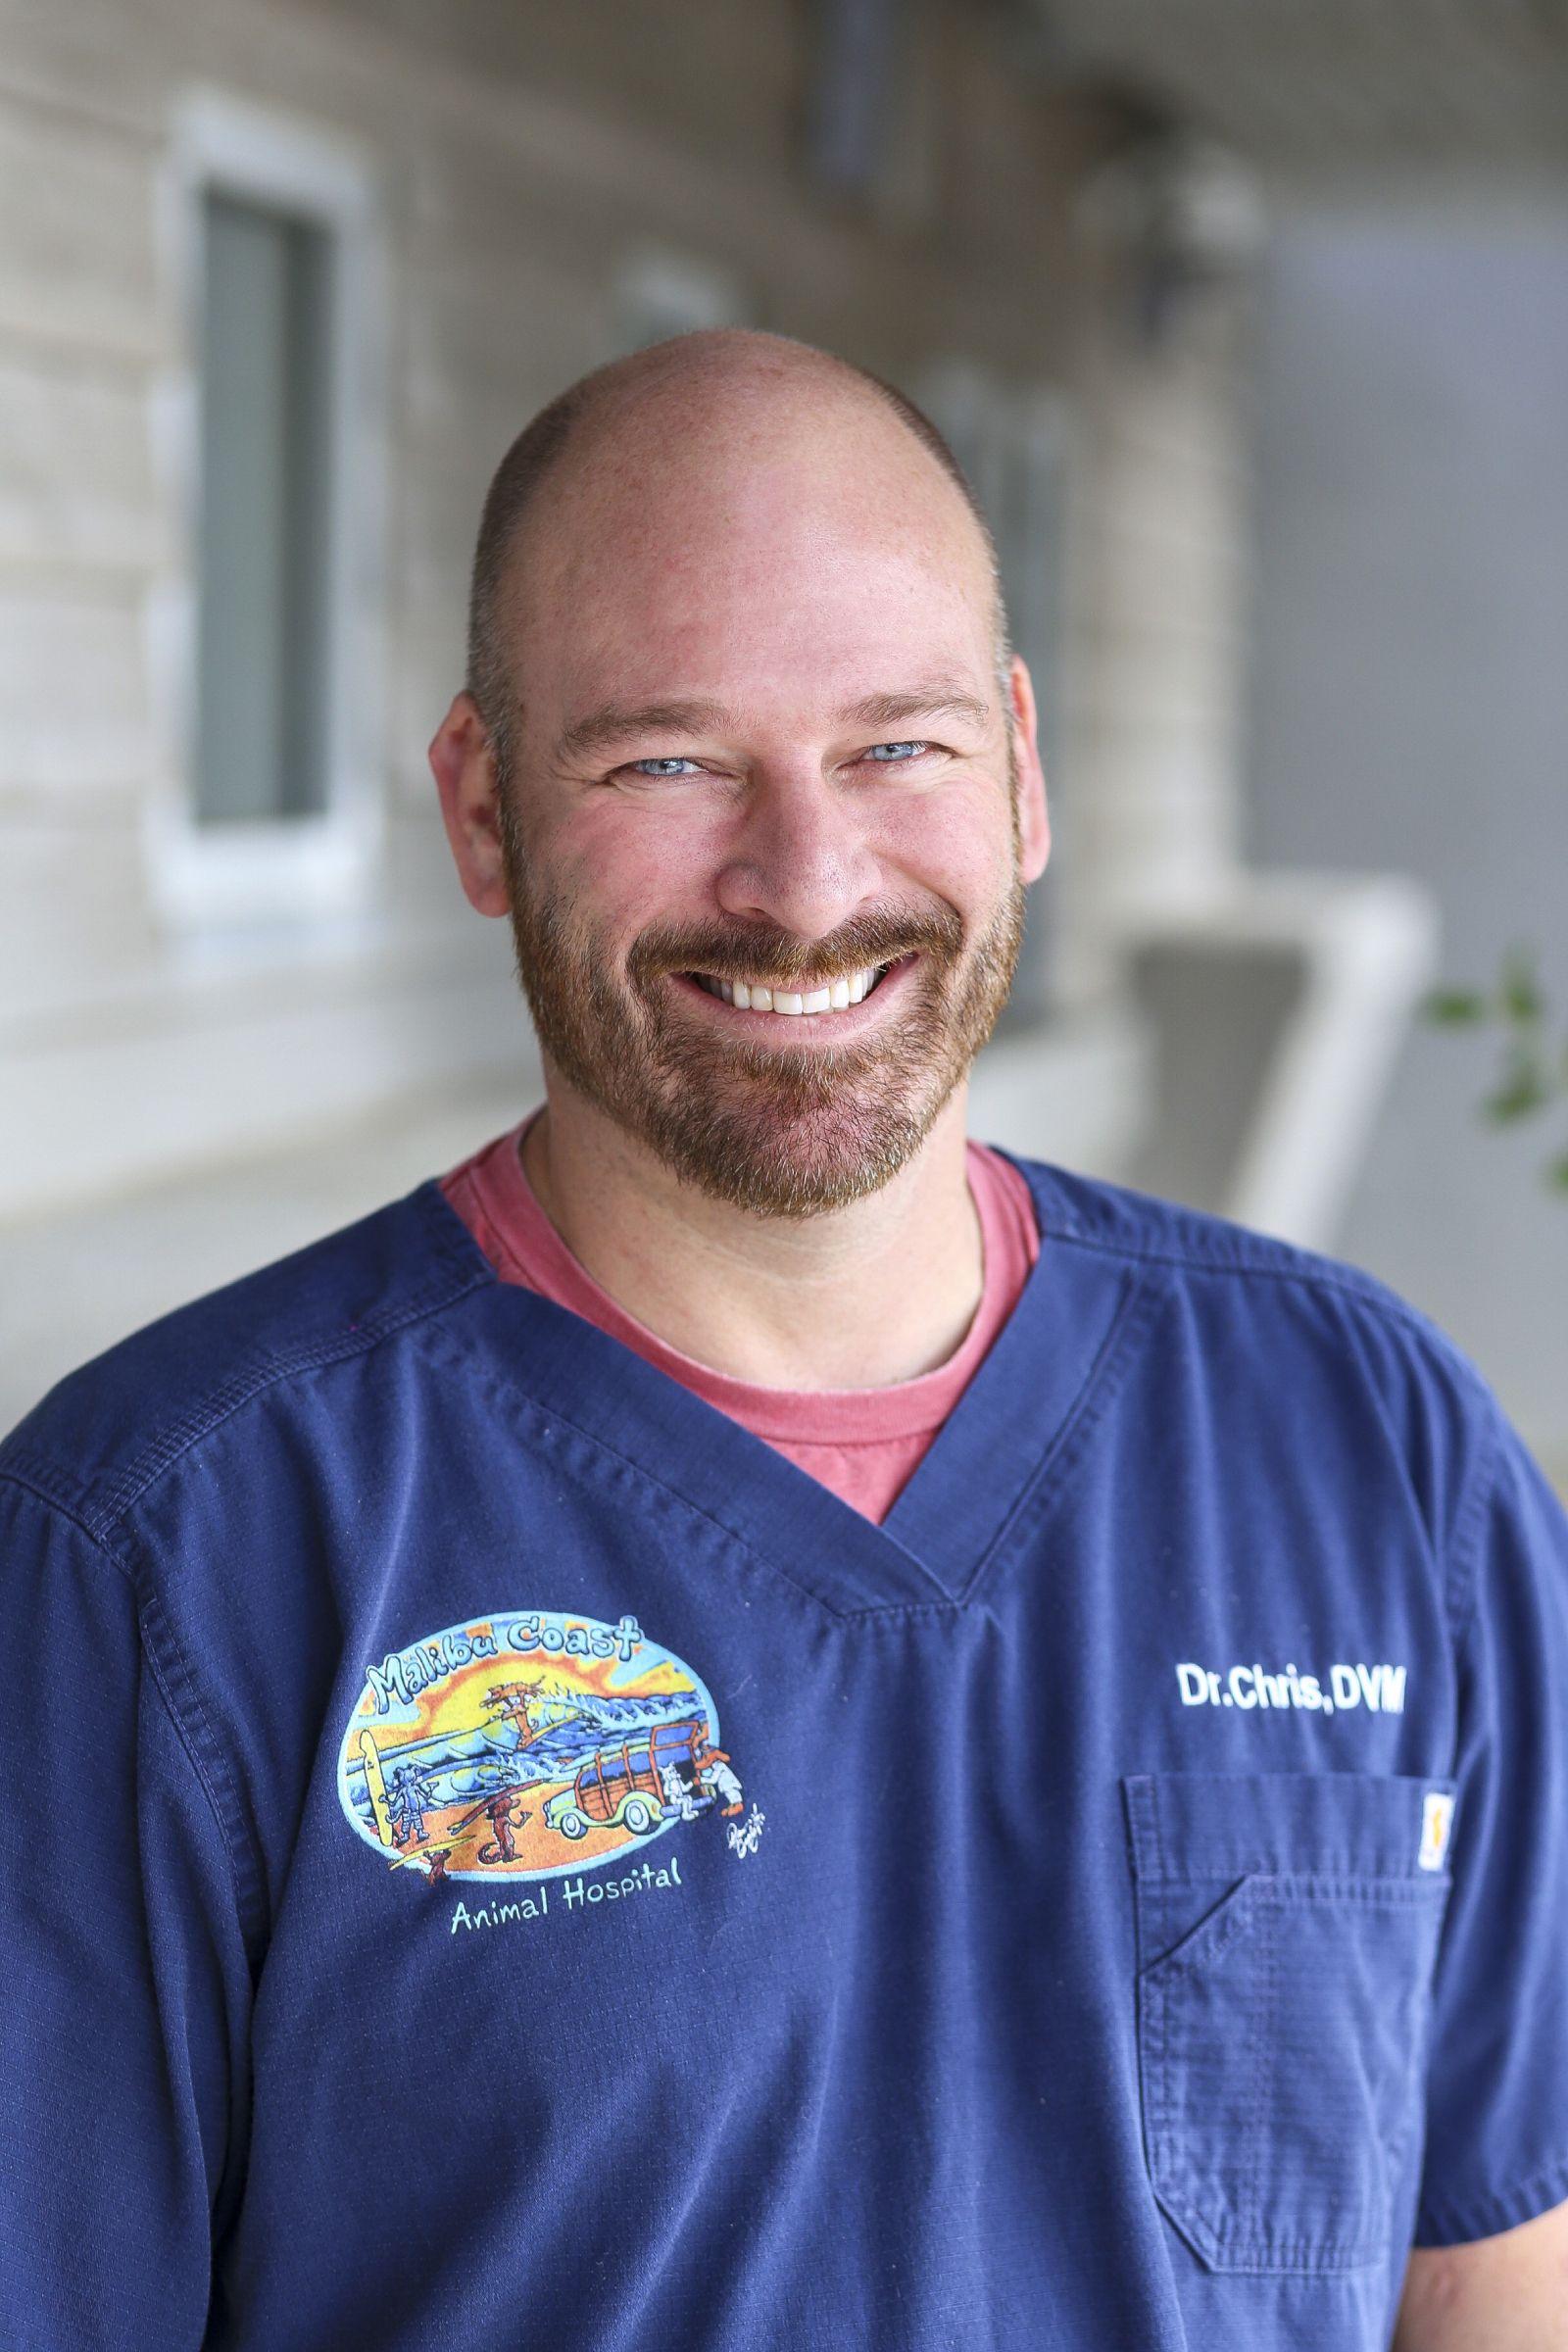 Dr. Chris Shule